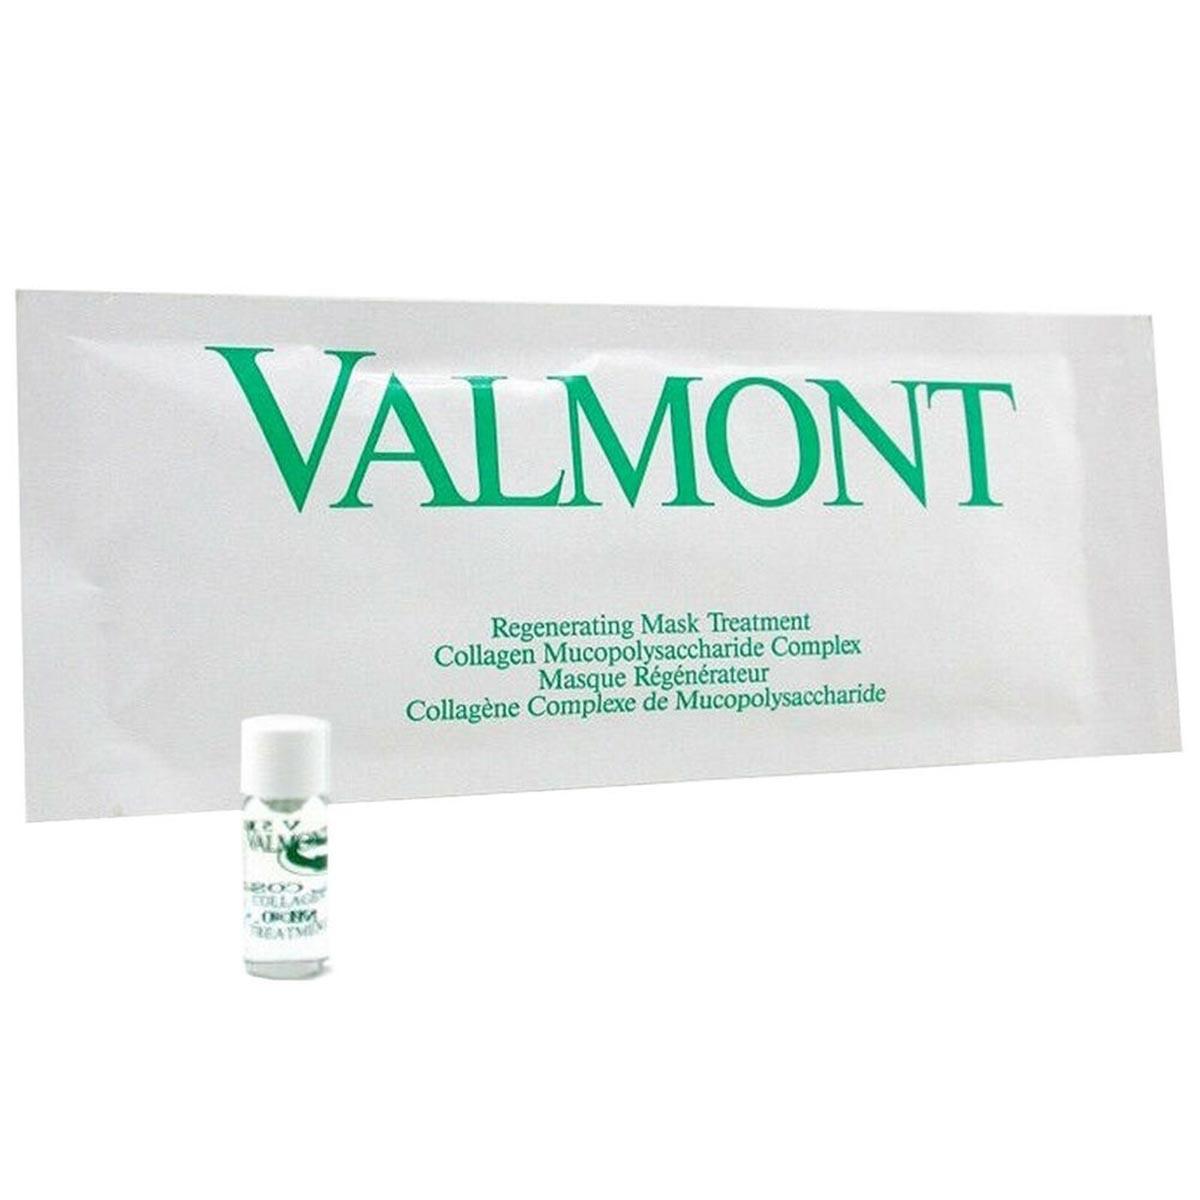 Valmont regenerating mask treatment 1u